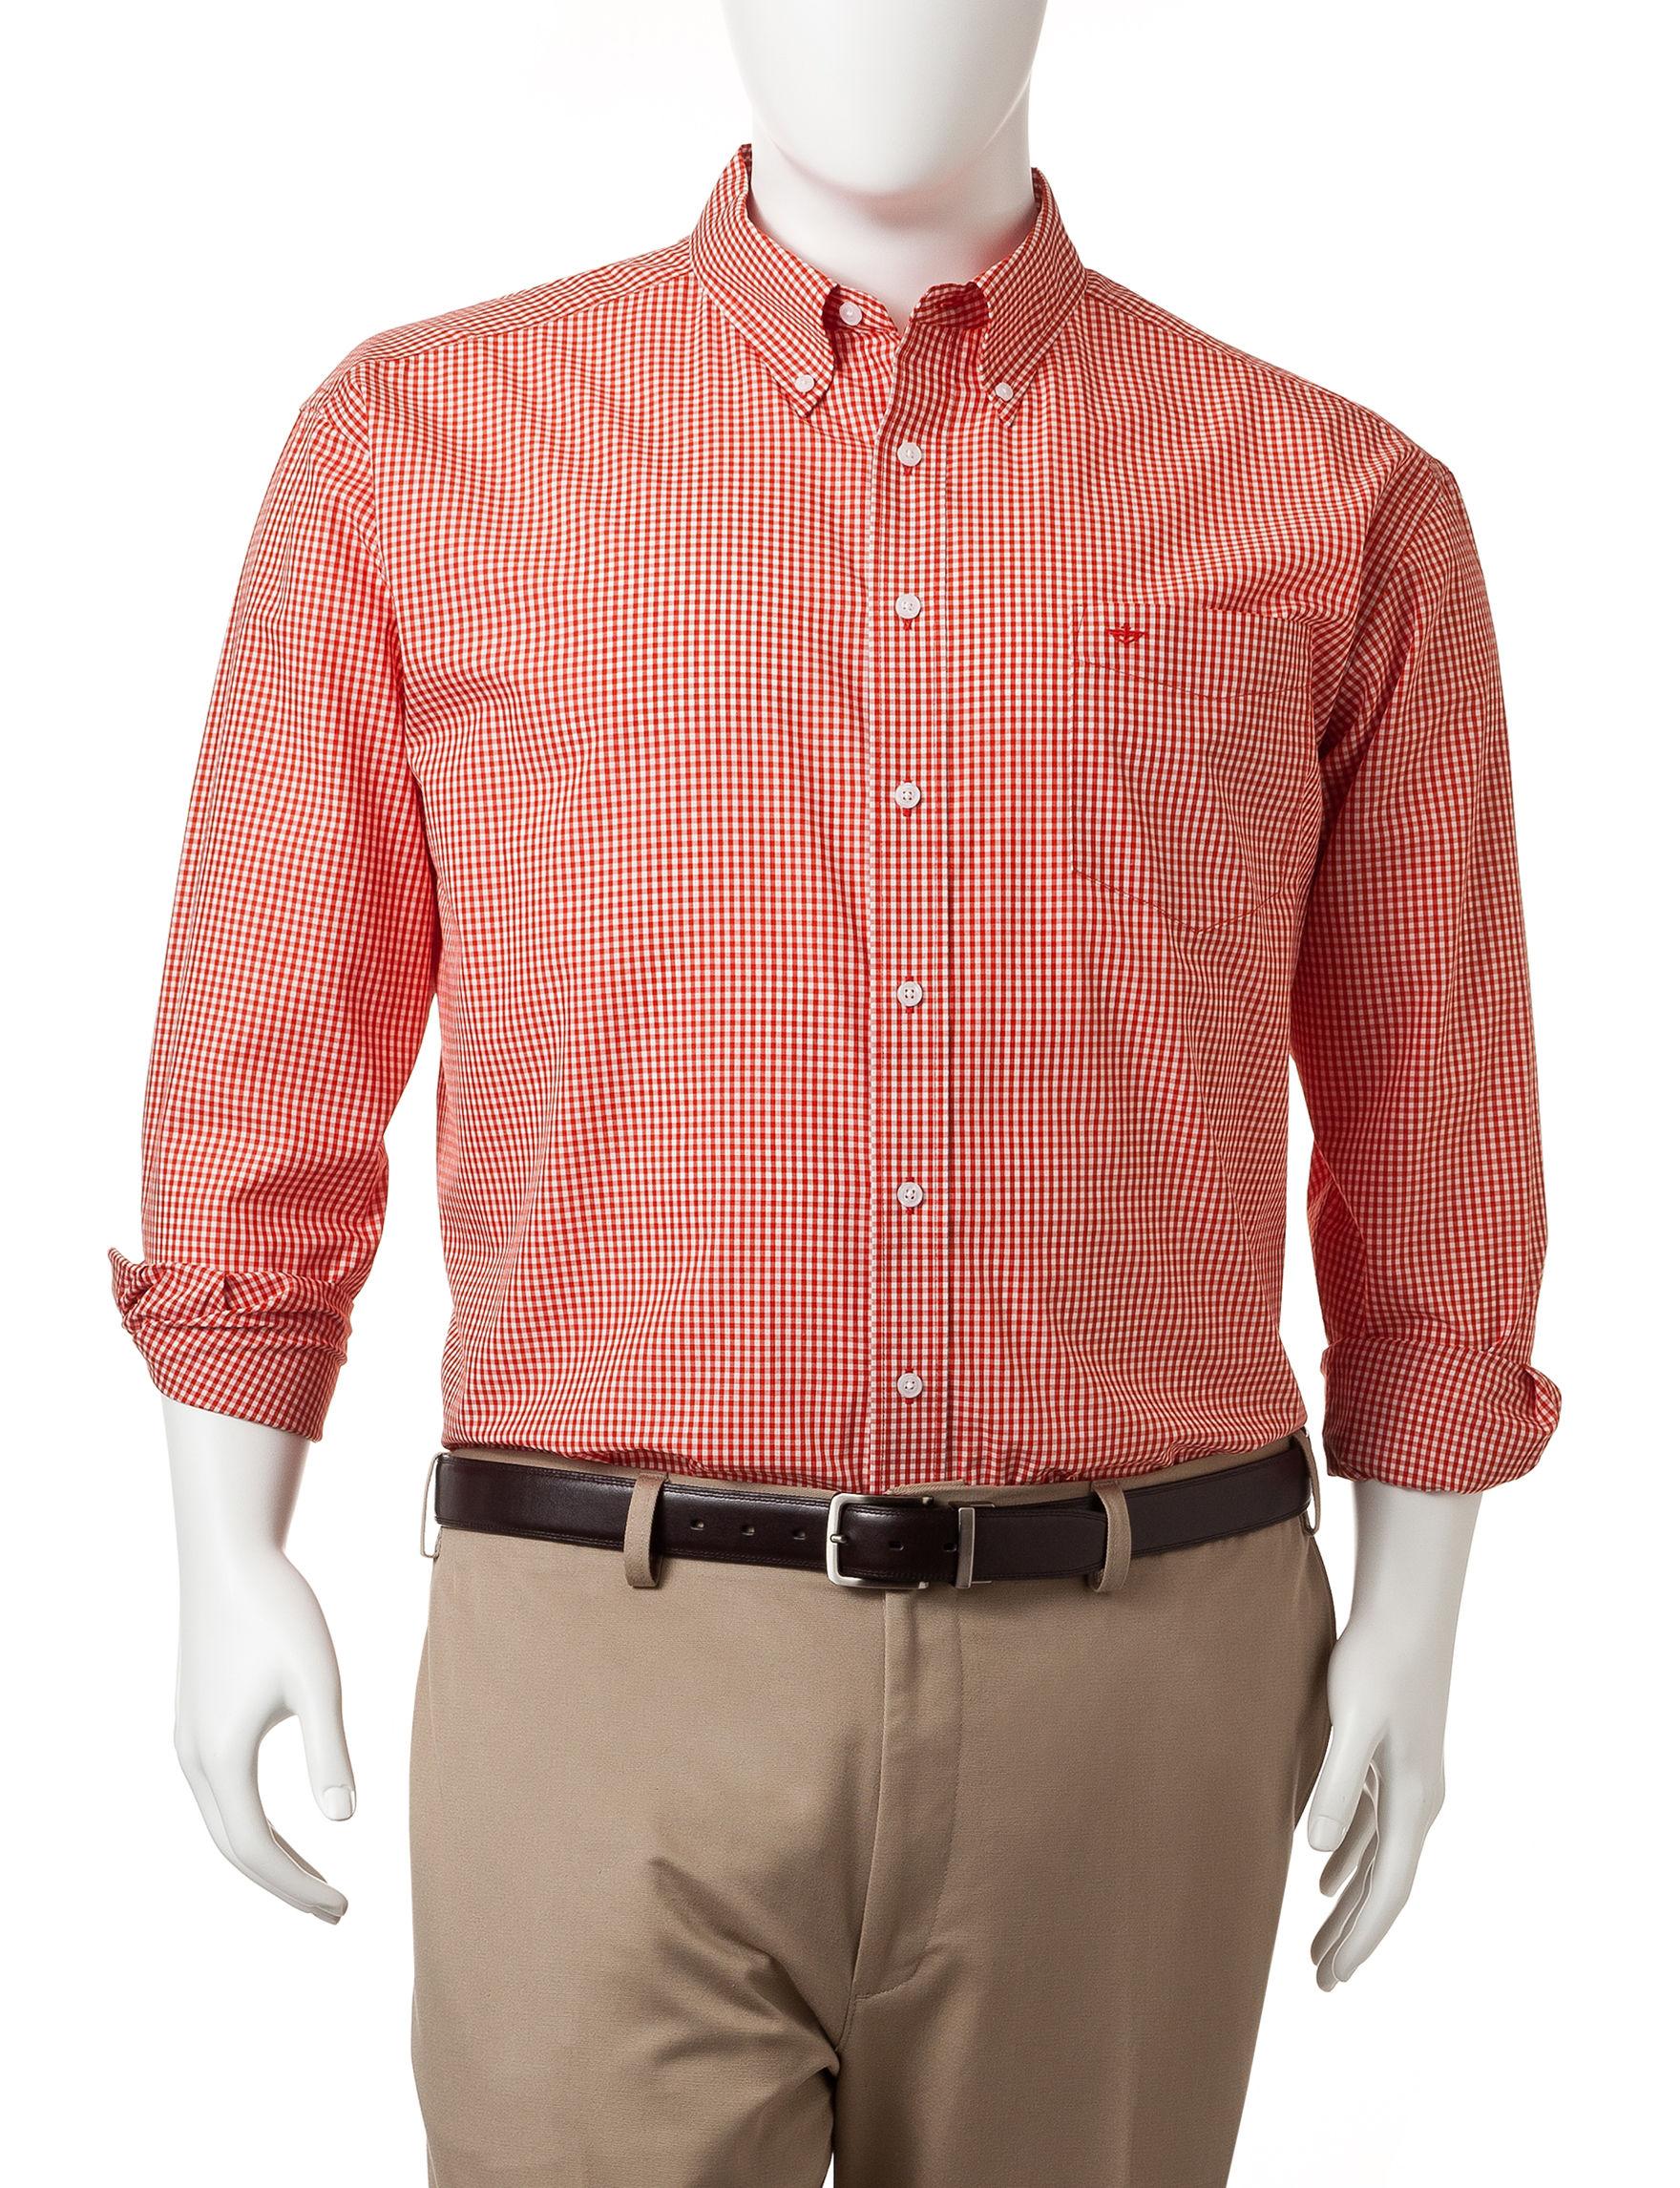 Dockers Orange Pop Casual Button Down Shirts